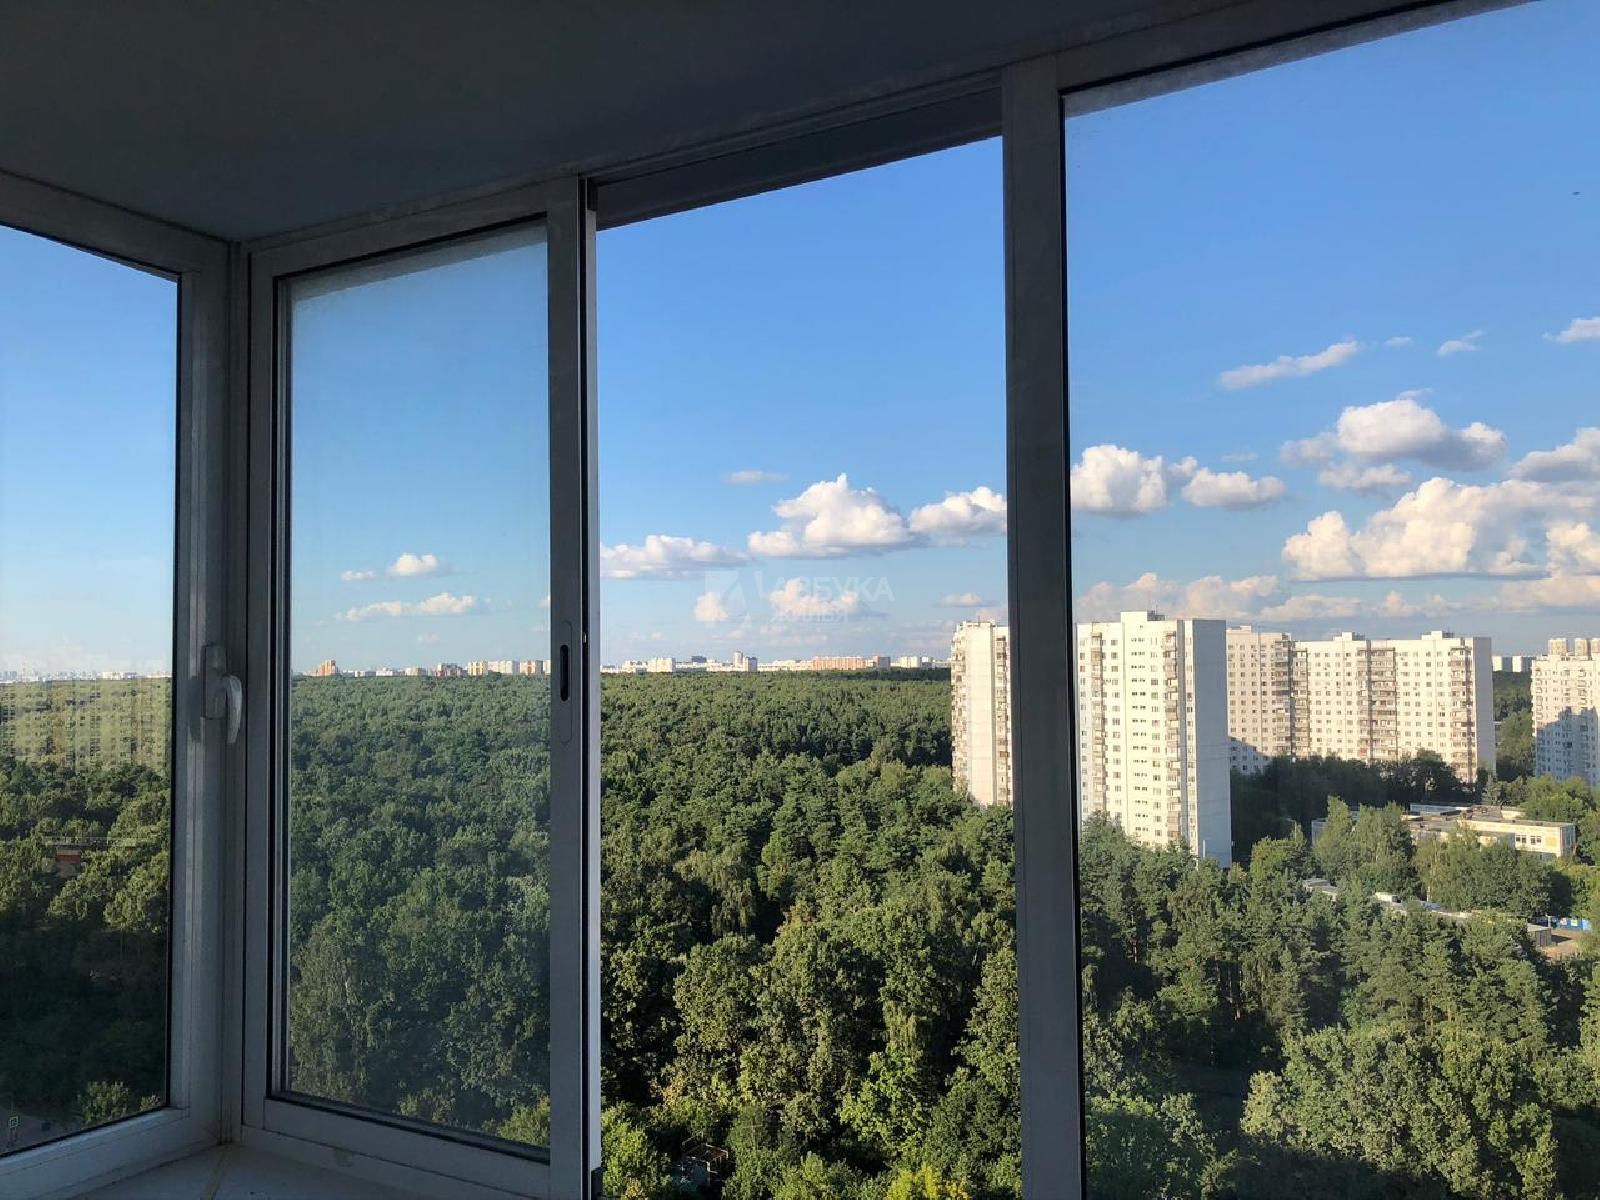 Фото №3 - 2-комнатная квартира, Москва, Липецкая улица 40, метро Кантемировская